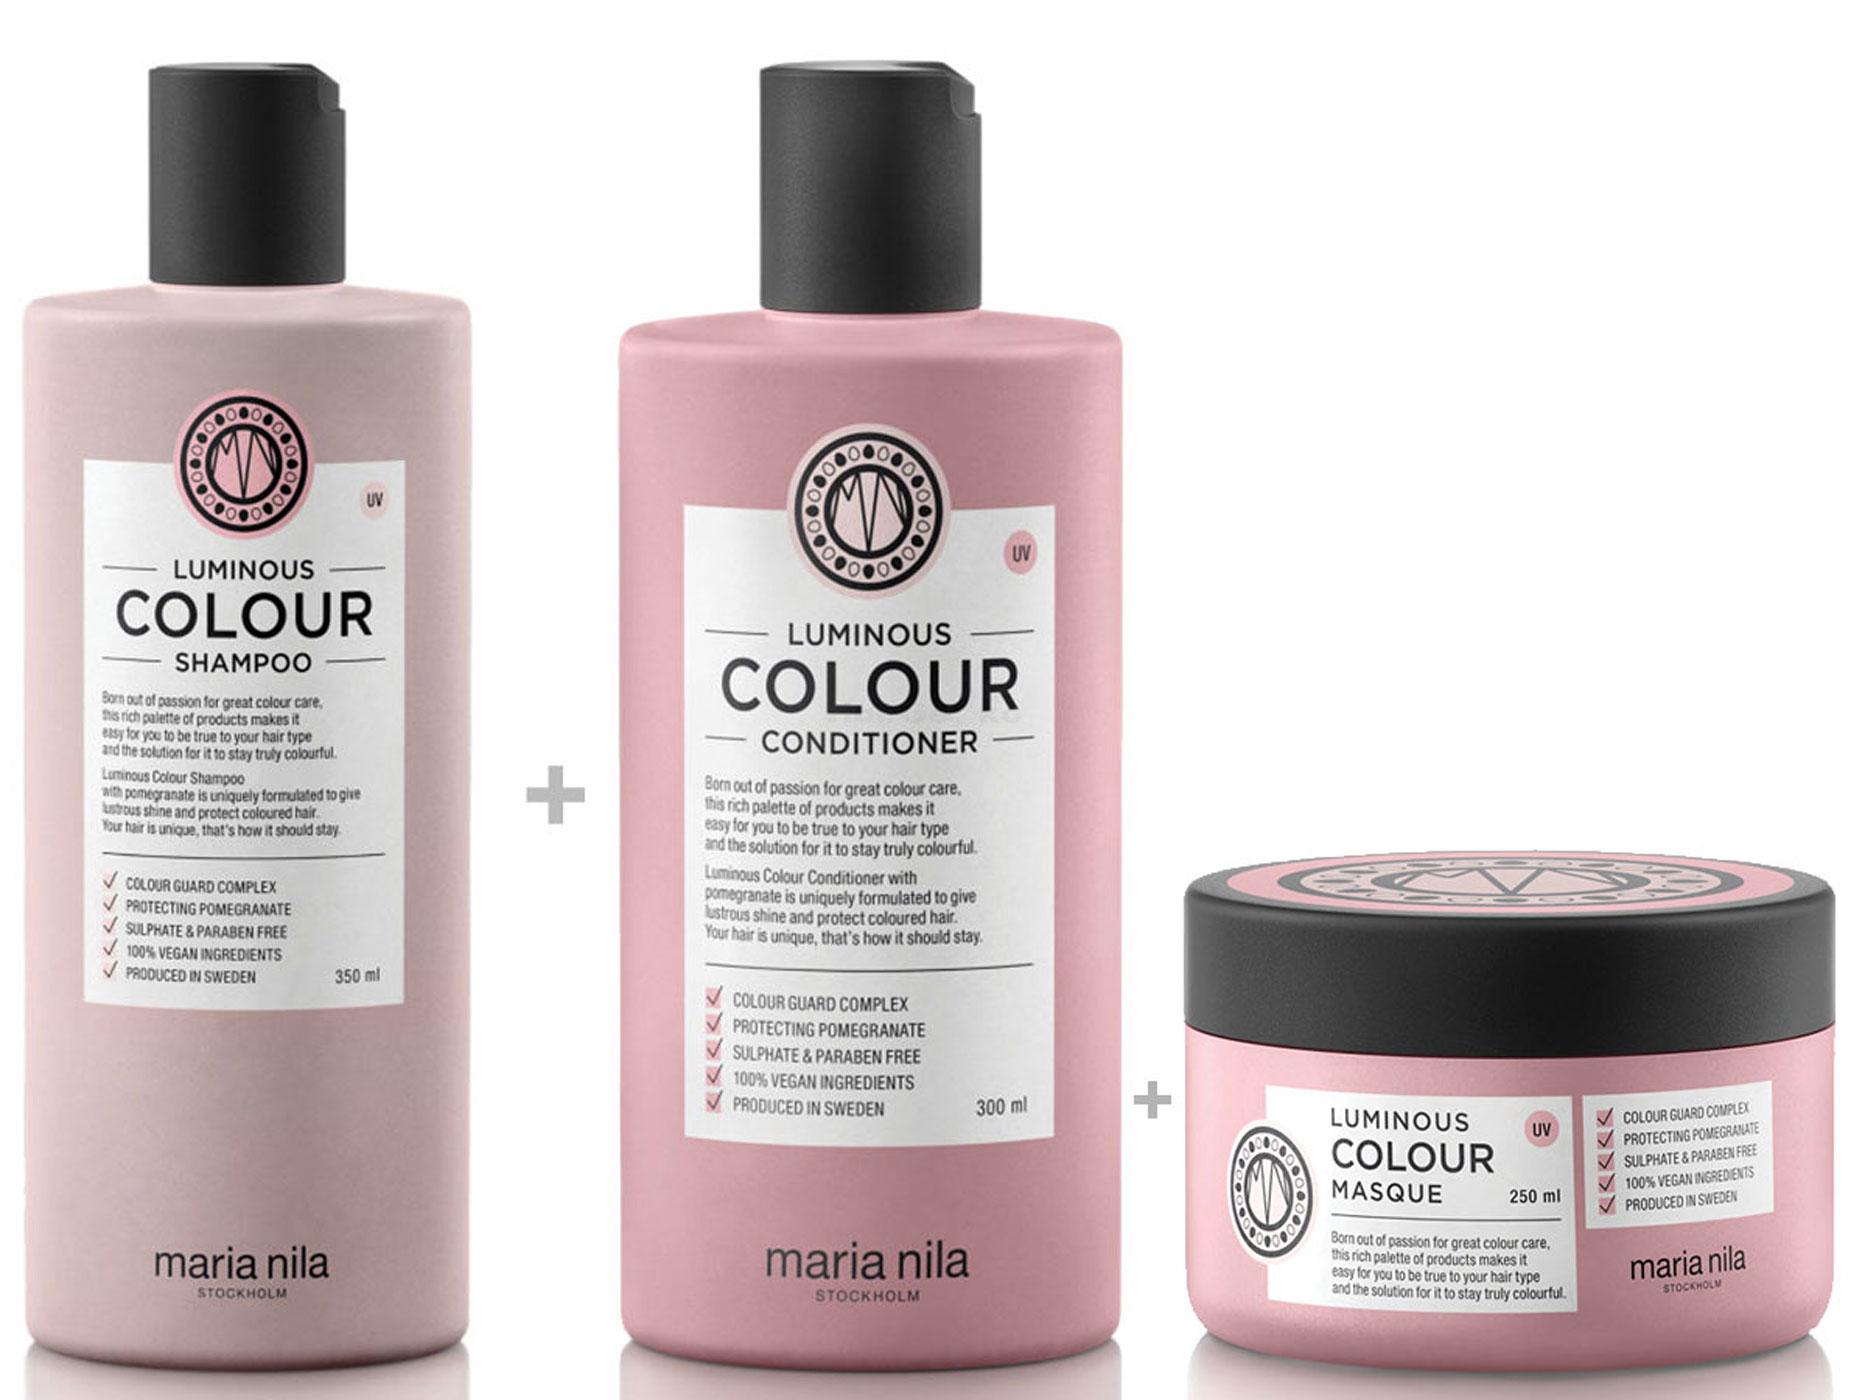 Maria Nila Luminous Colour Set - Shampoo 350 ml + Conditioner 300 ml + Masque / Maske 250 ml